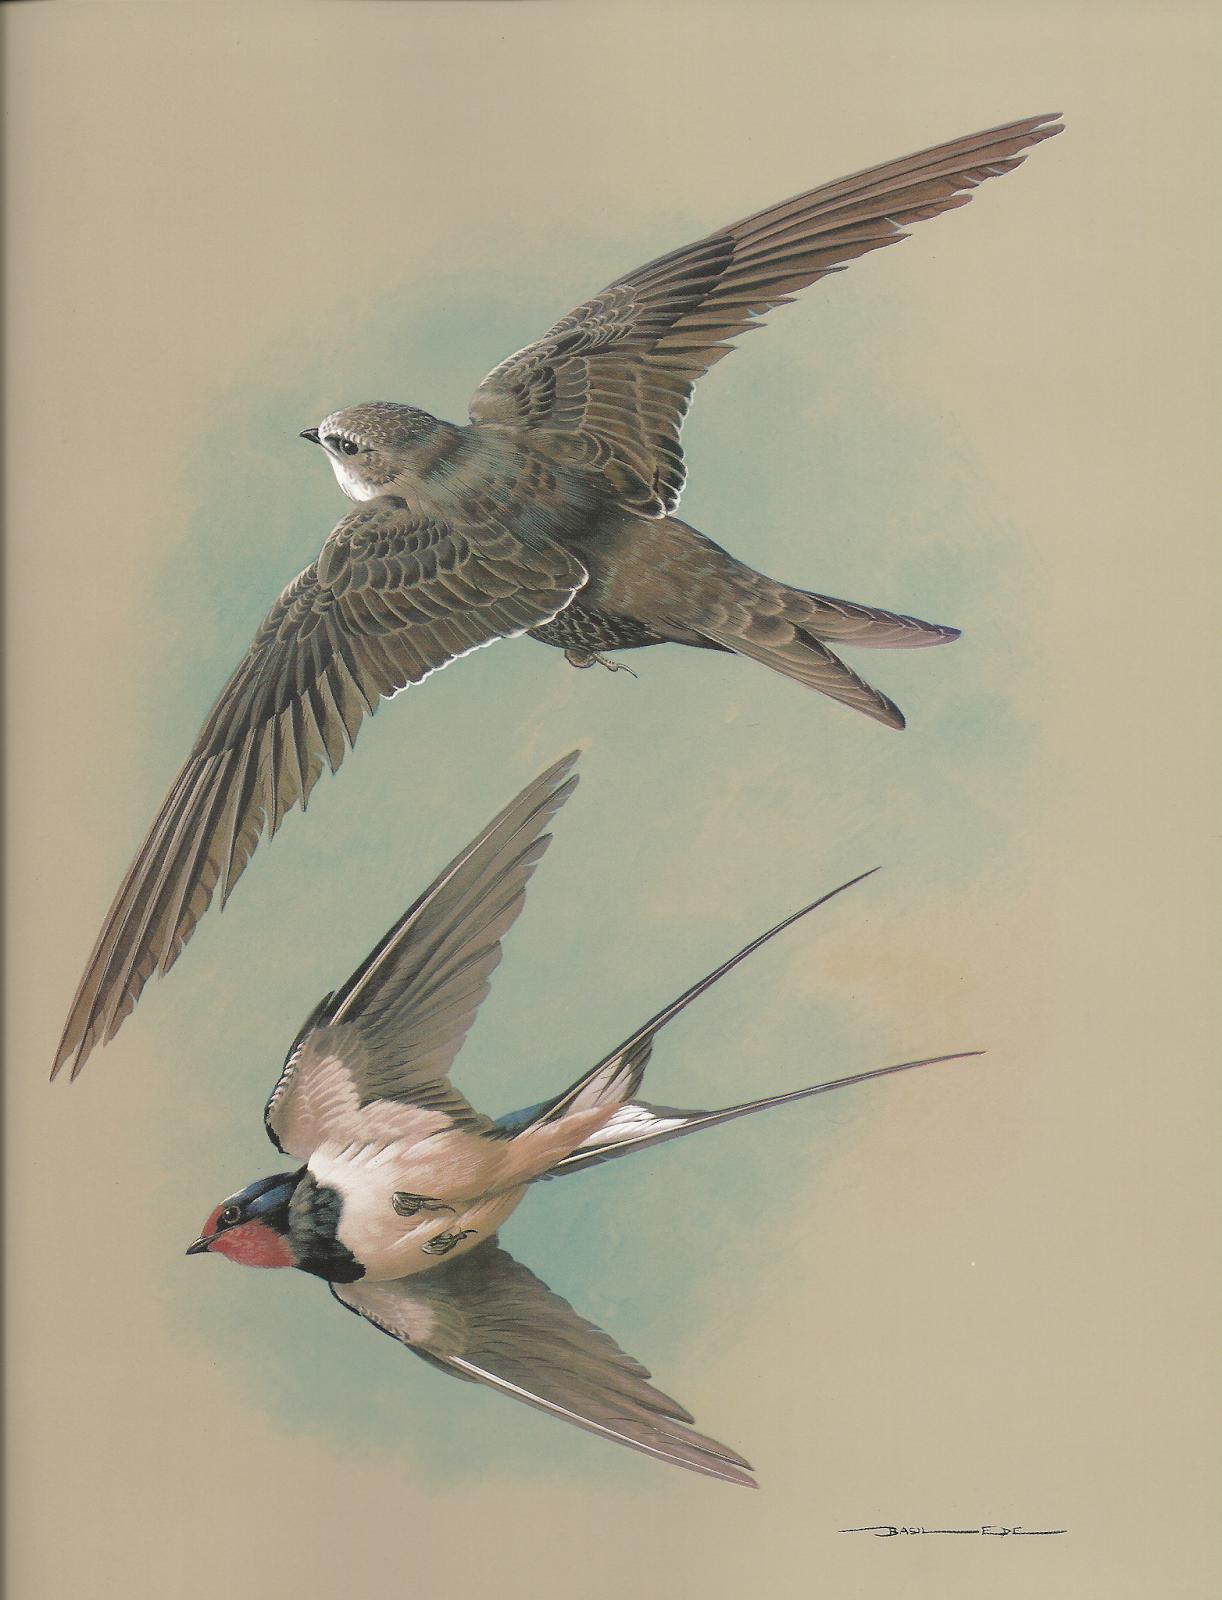 Free Images of Birds | Pinterest | Golondrina, Pájaro y Ave